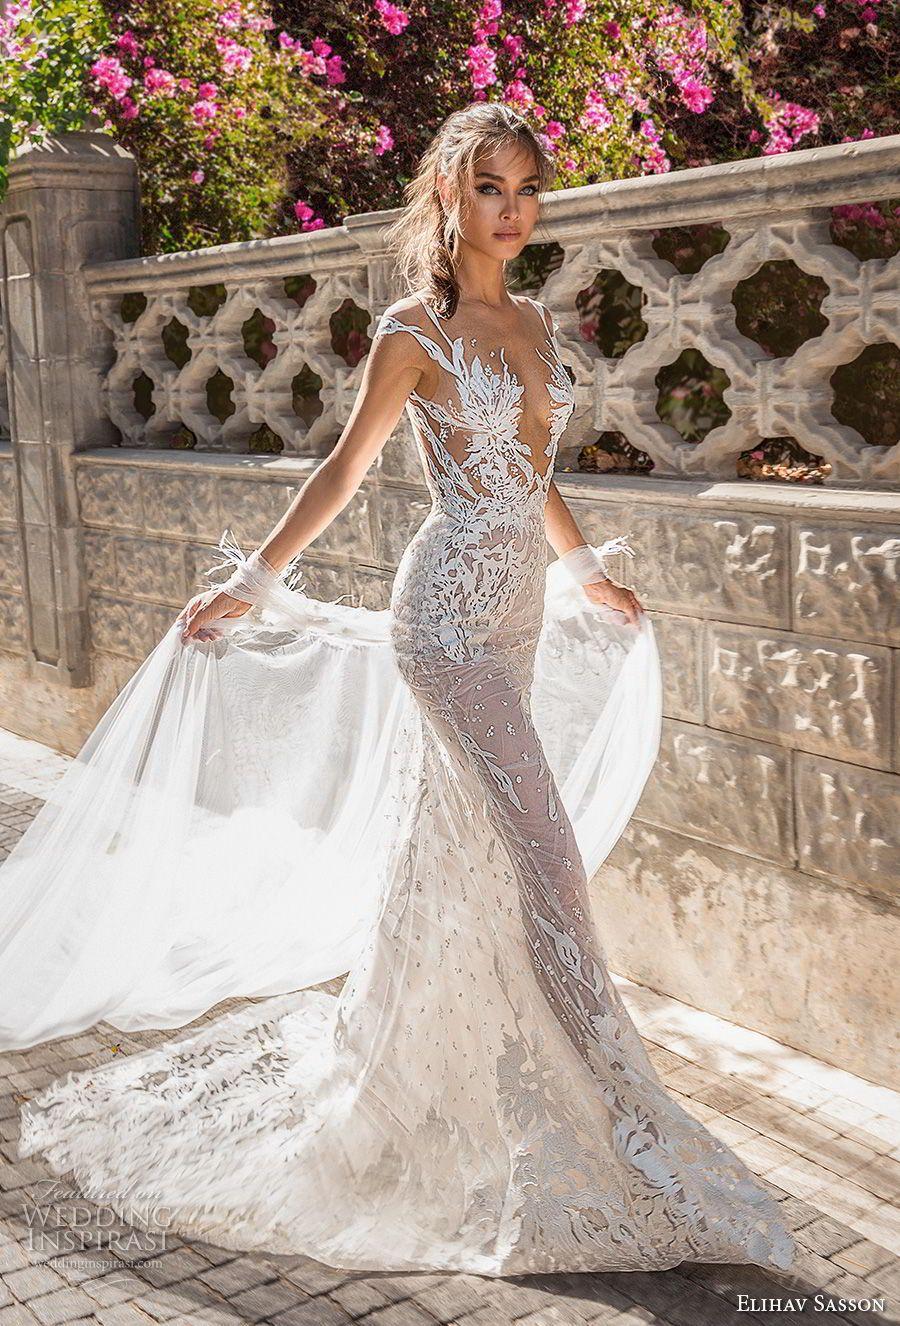 Elihav Sasson 2018 Royalty Girl Capsule Collection | Royalty ...